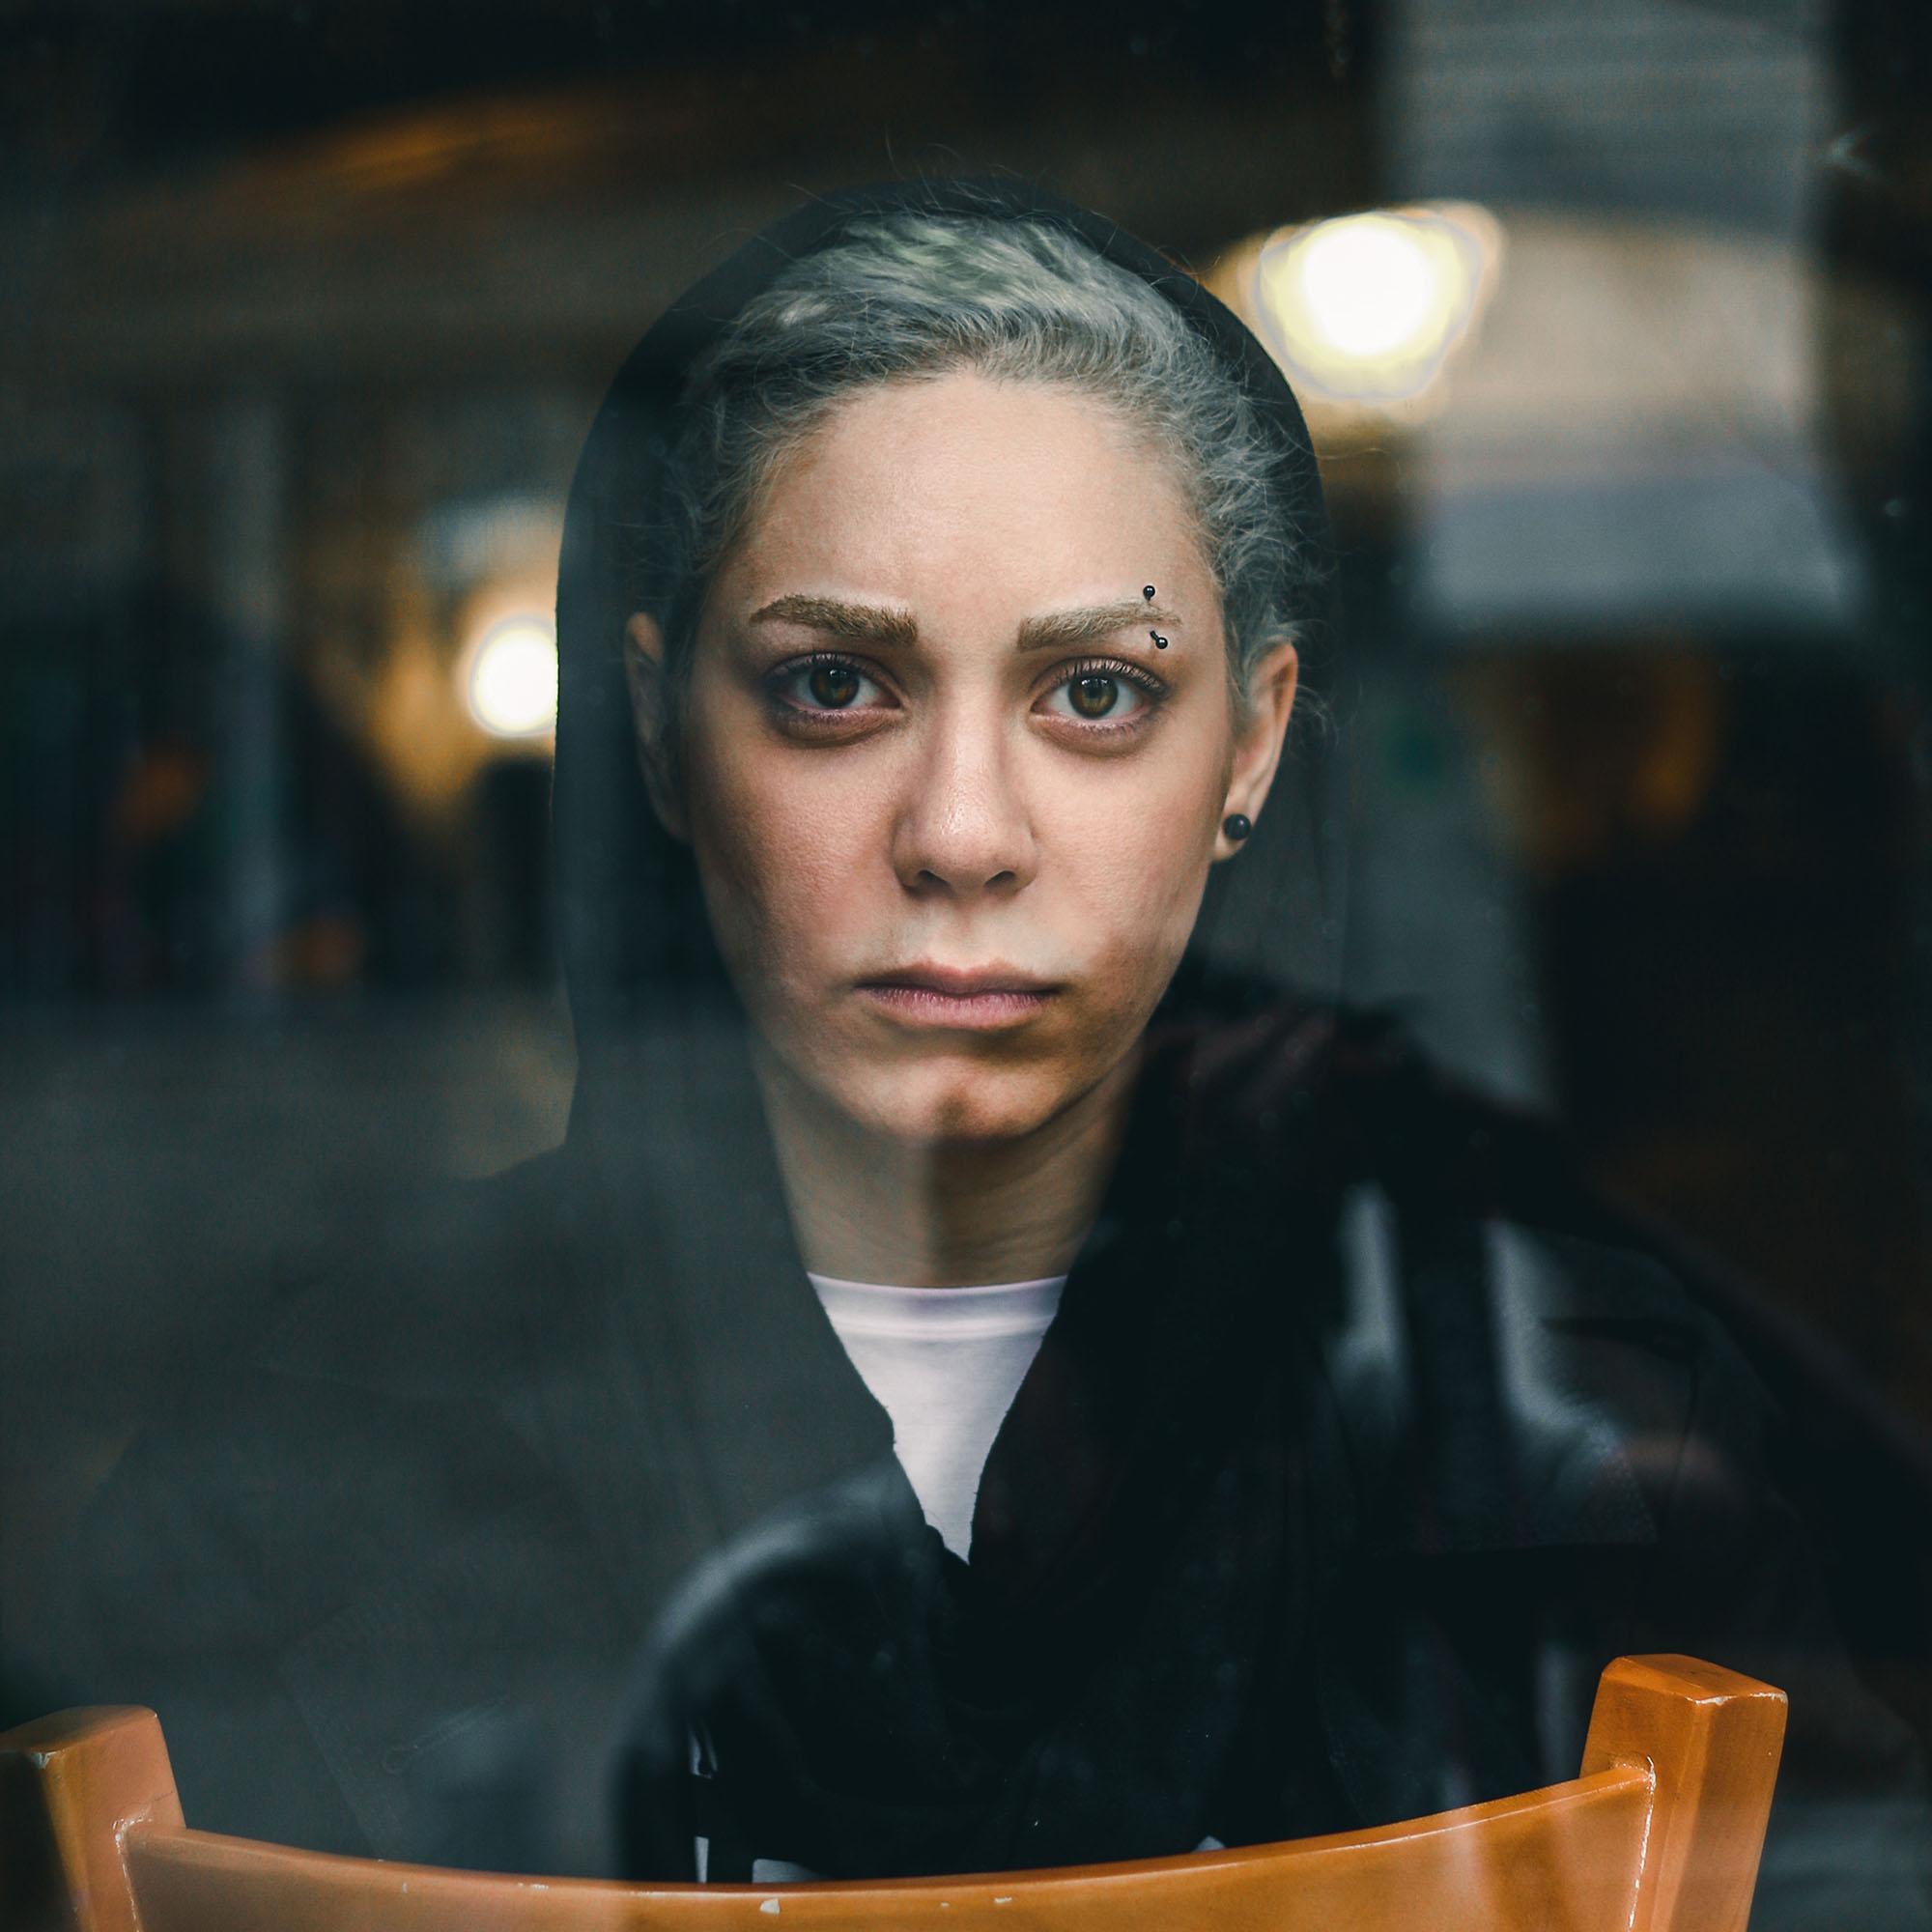 10 Photorealistic Portraits That Will Amaze You